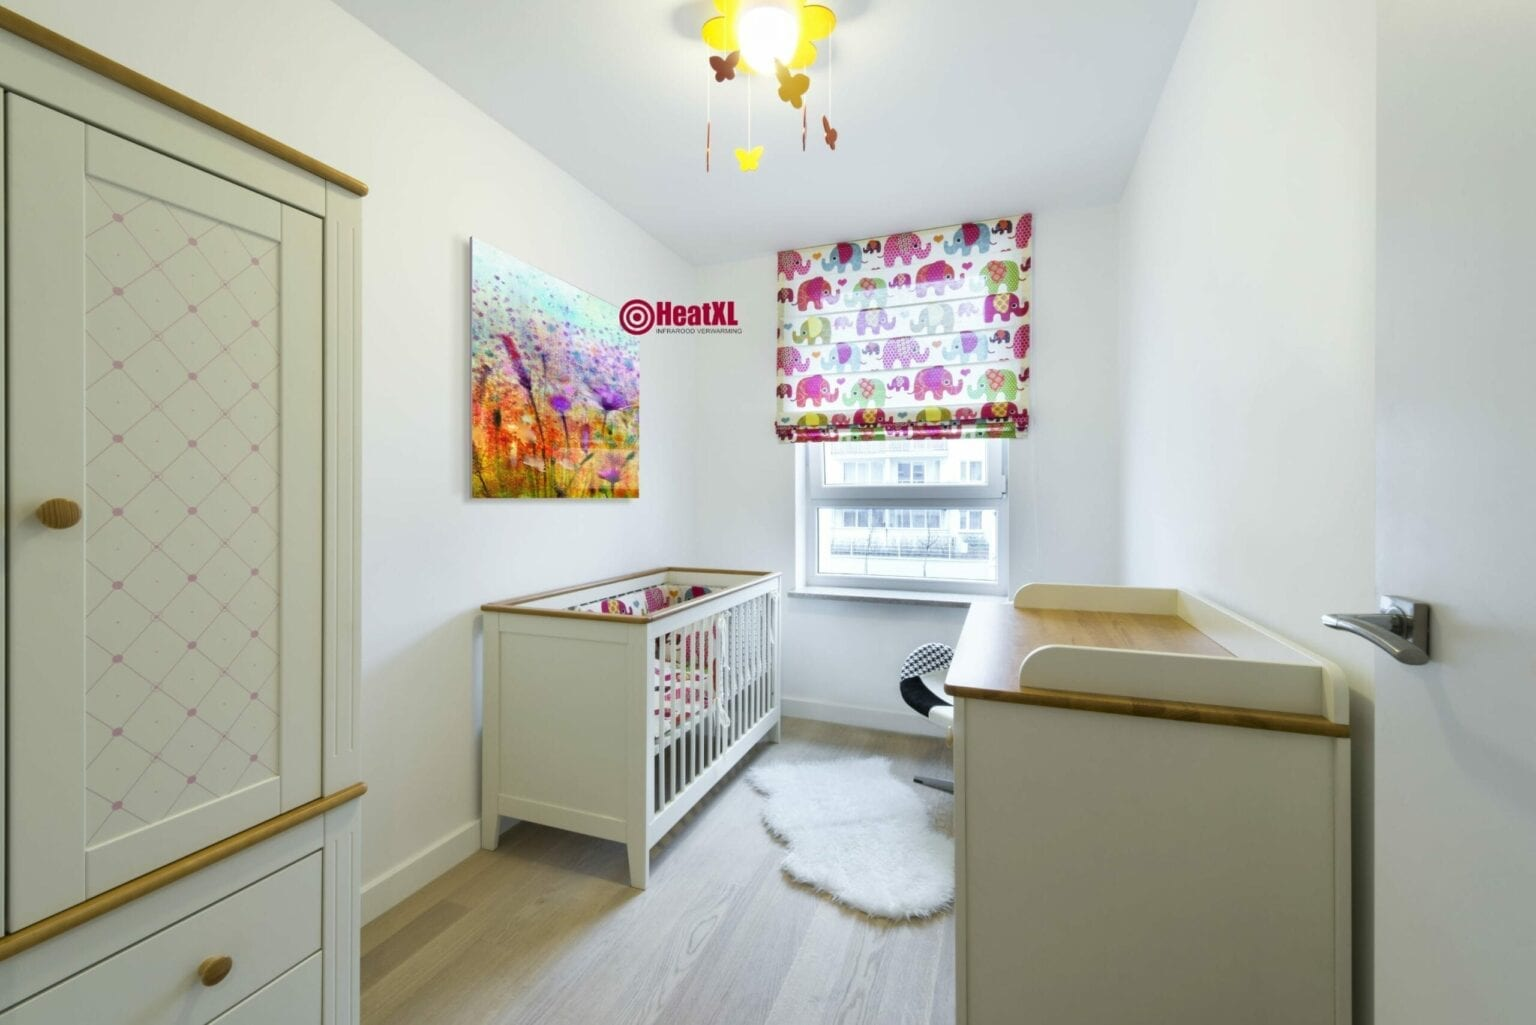 warmtepanelen Infraroodpaneel infrarood panelen infrarood verwarming warmtepaneel verwarmingspaneel, plafond wand